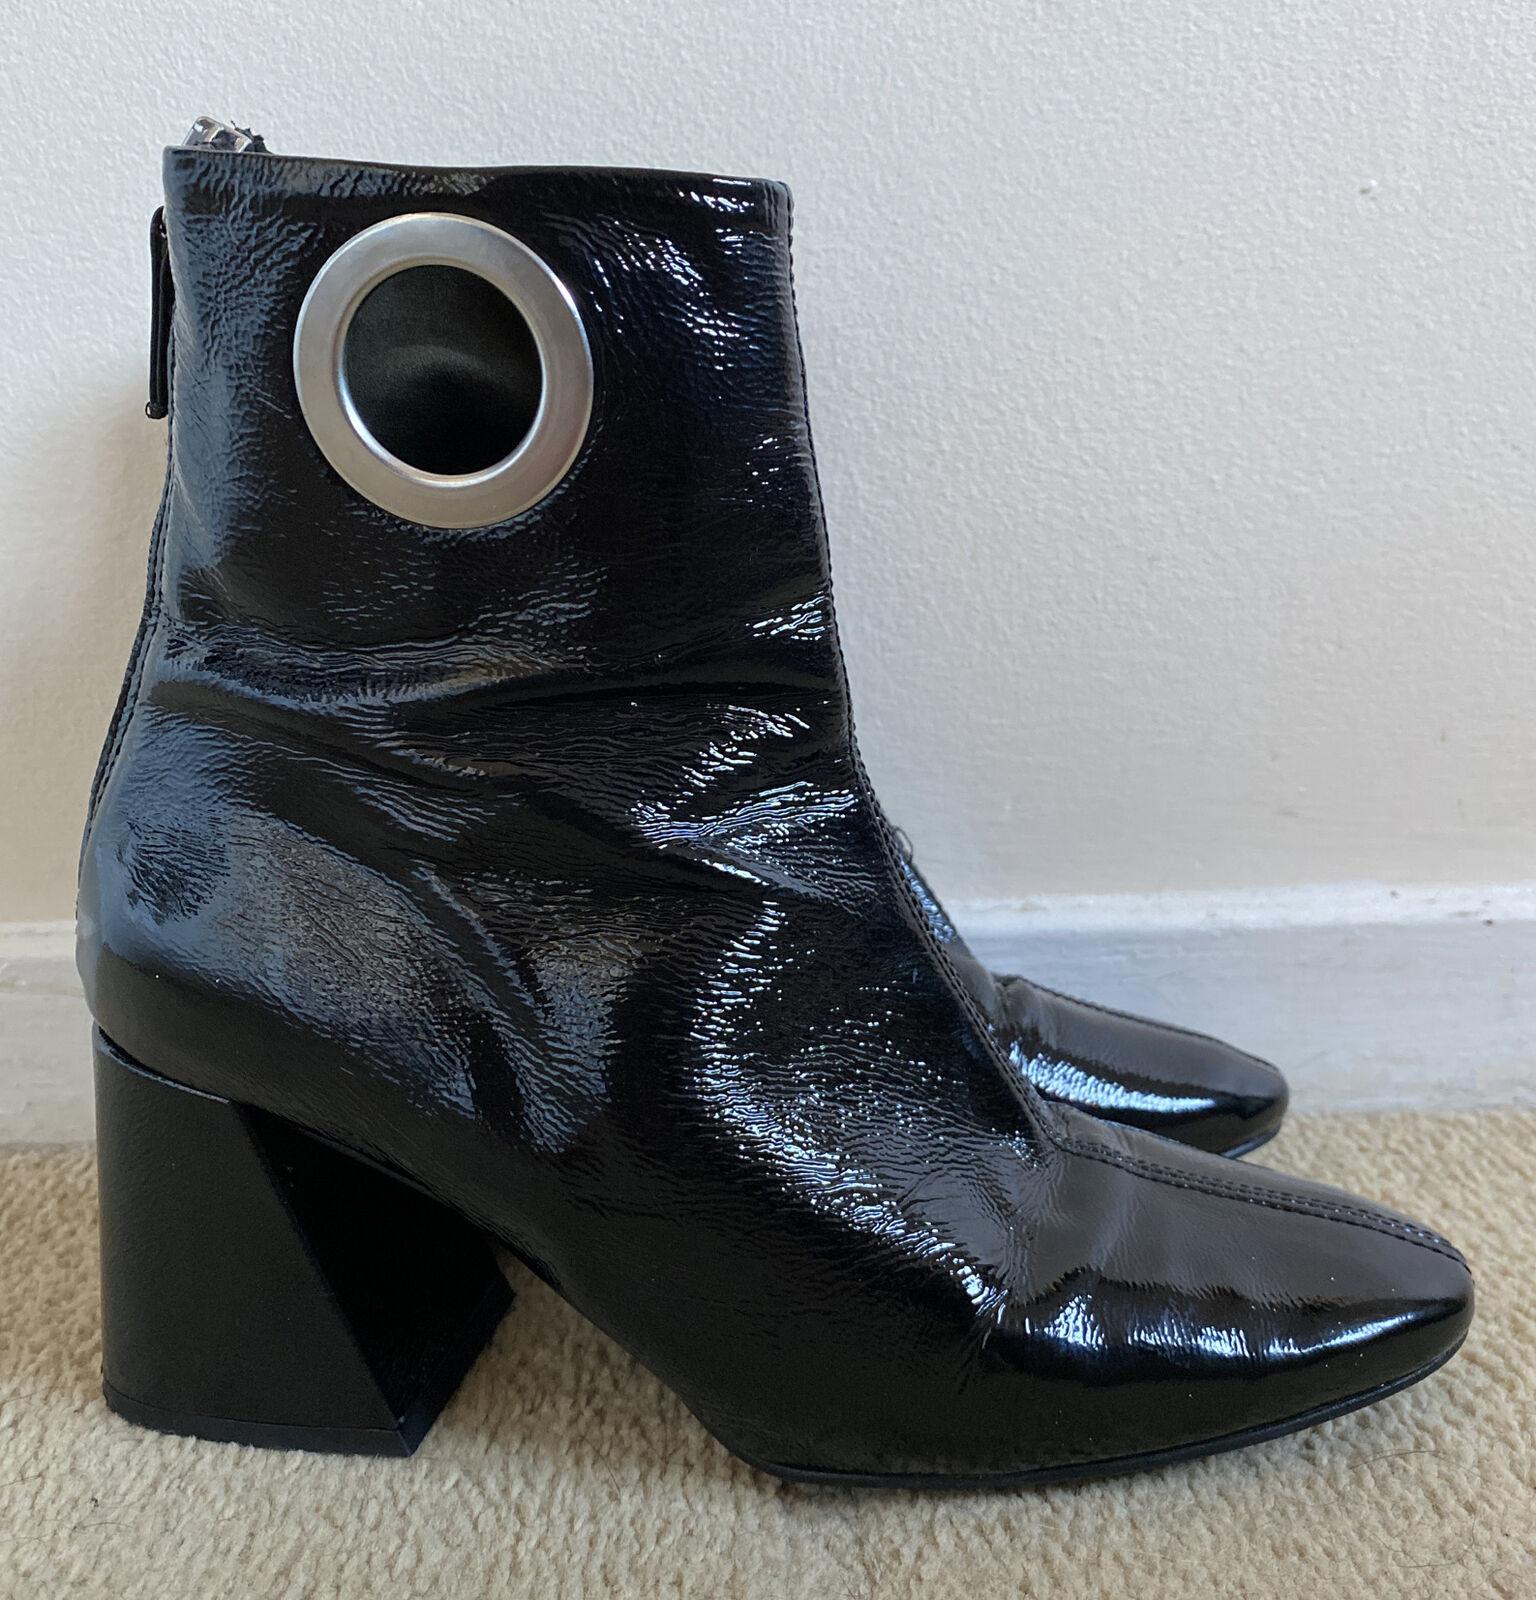 Topshop Size 7 / EUR 40 Black Faux Leather Circle Cut Out 1970s Ankle Boots